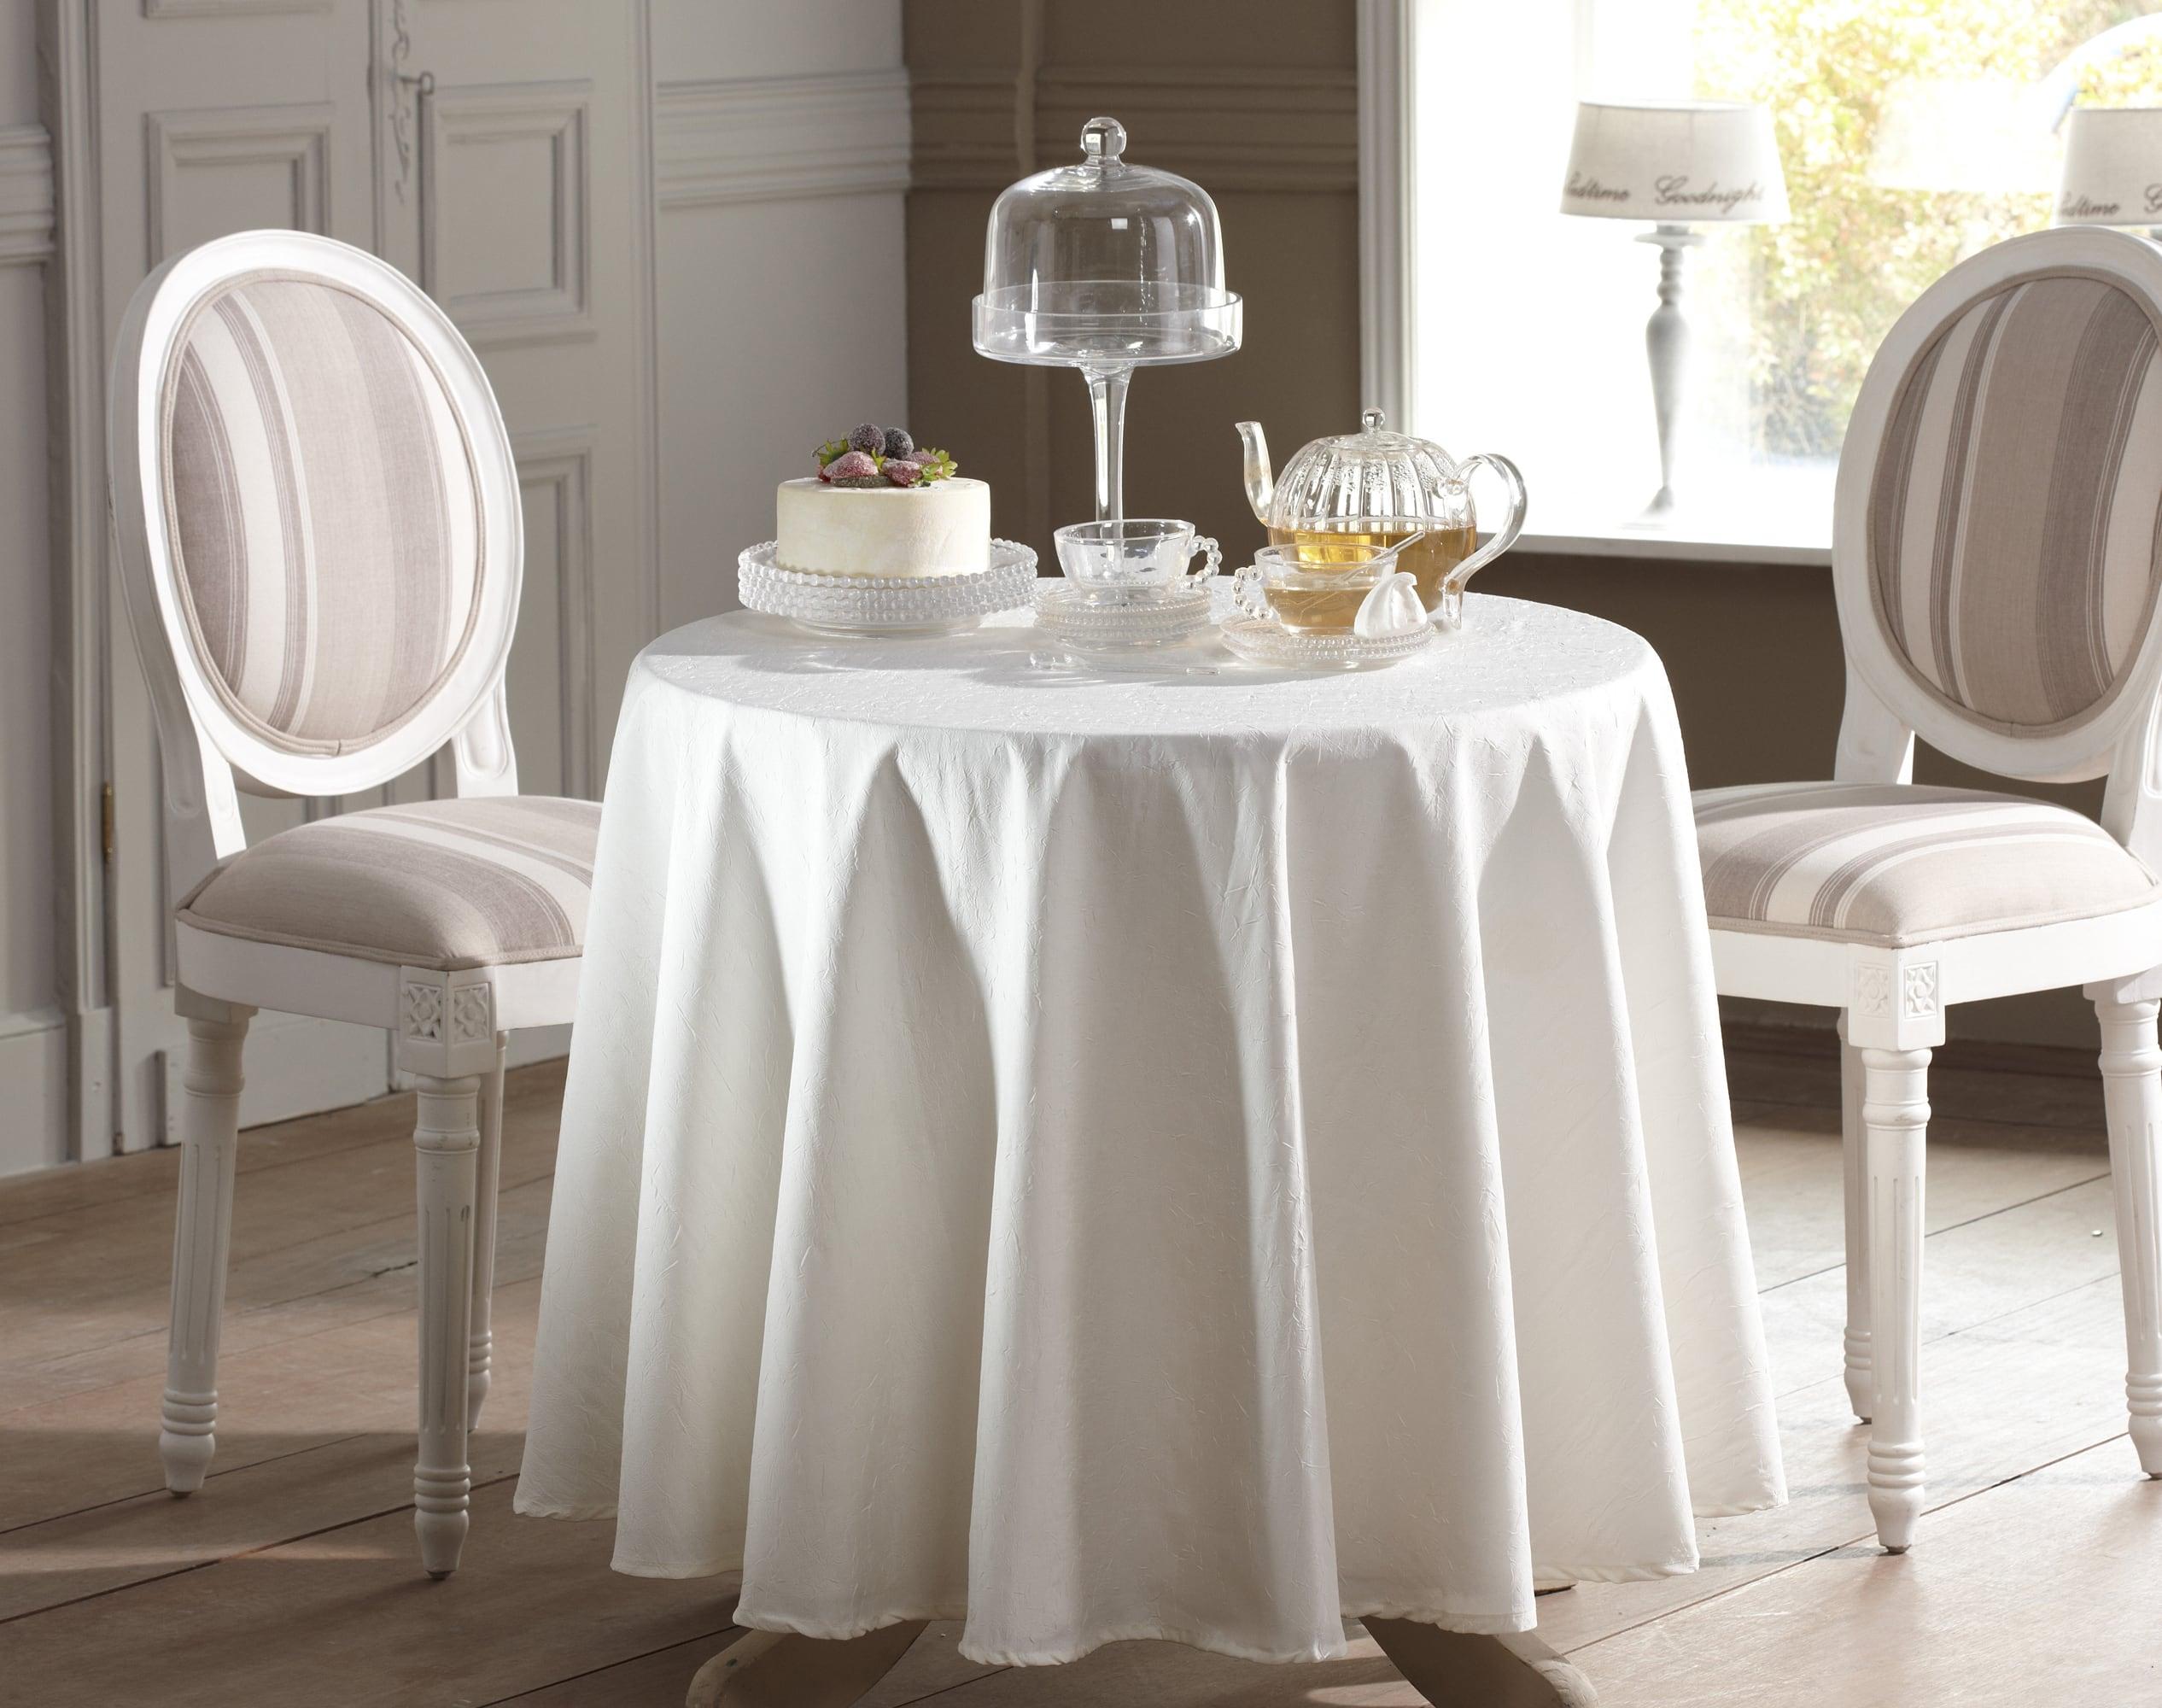 Nappe rectangulaire blanc en polyester 150x250